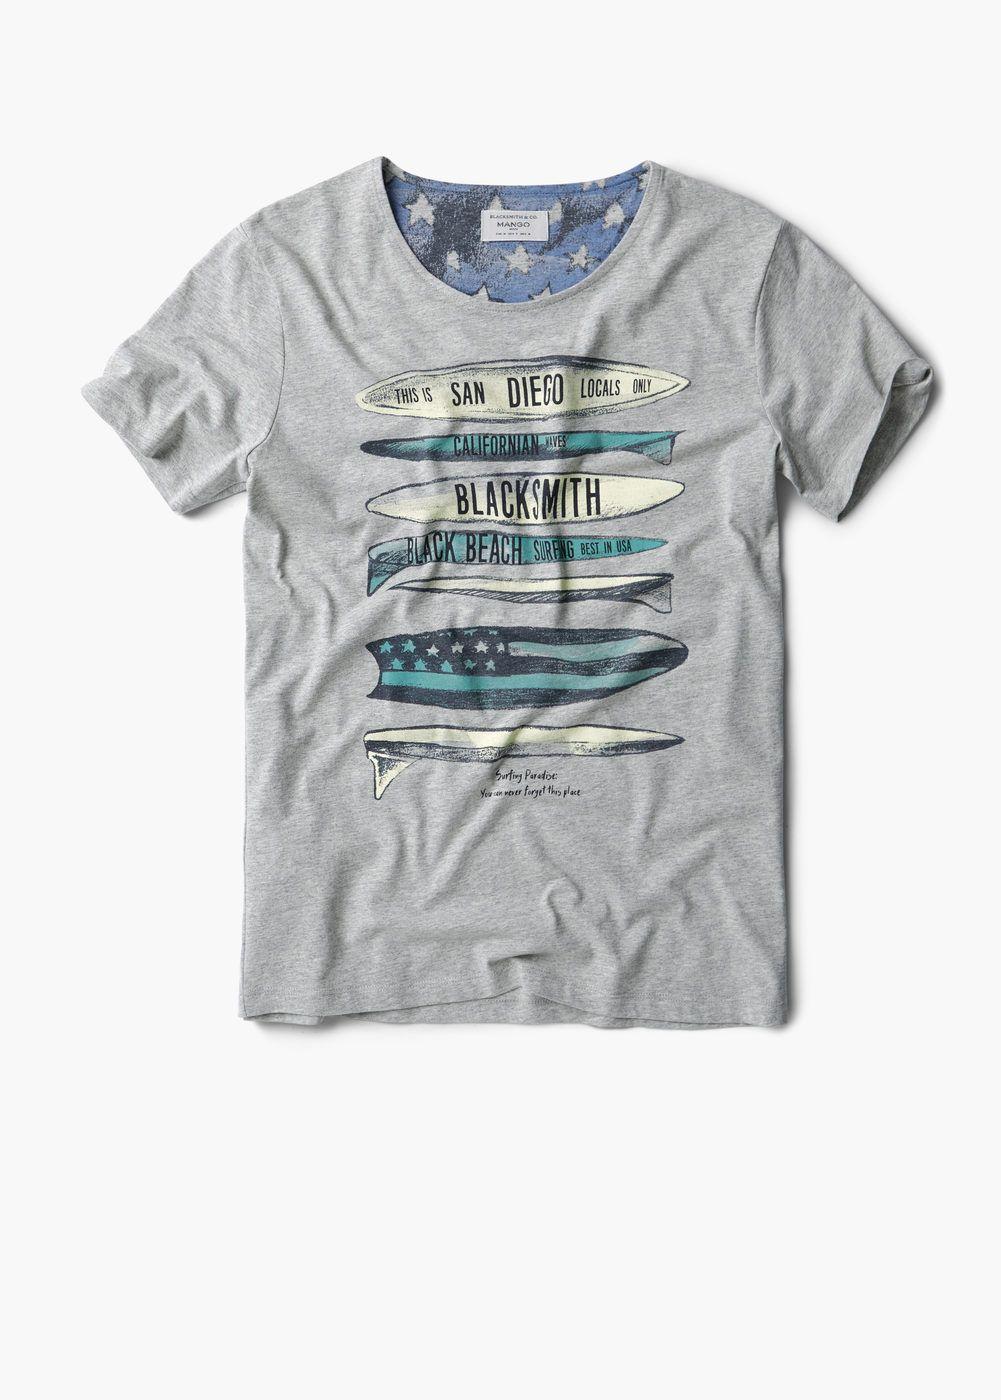 Bedrucktes Baumwoll T Shirt Herren Mango Man Deutschland Camiseta Masculina Camiseta Camisetas Para Meninos